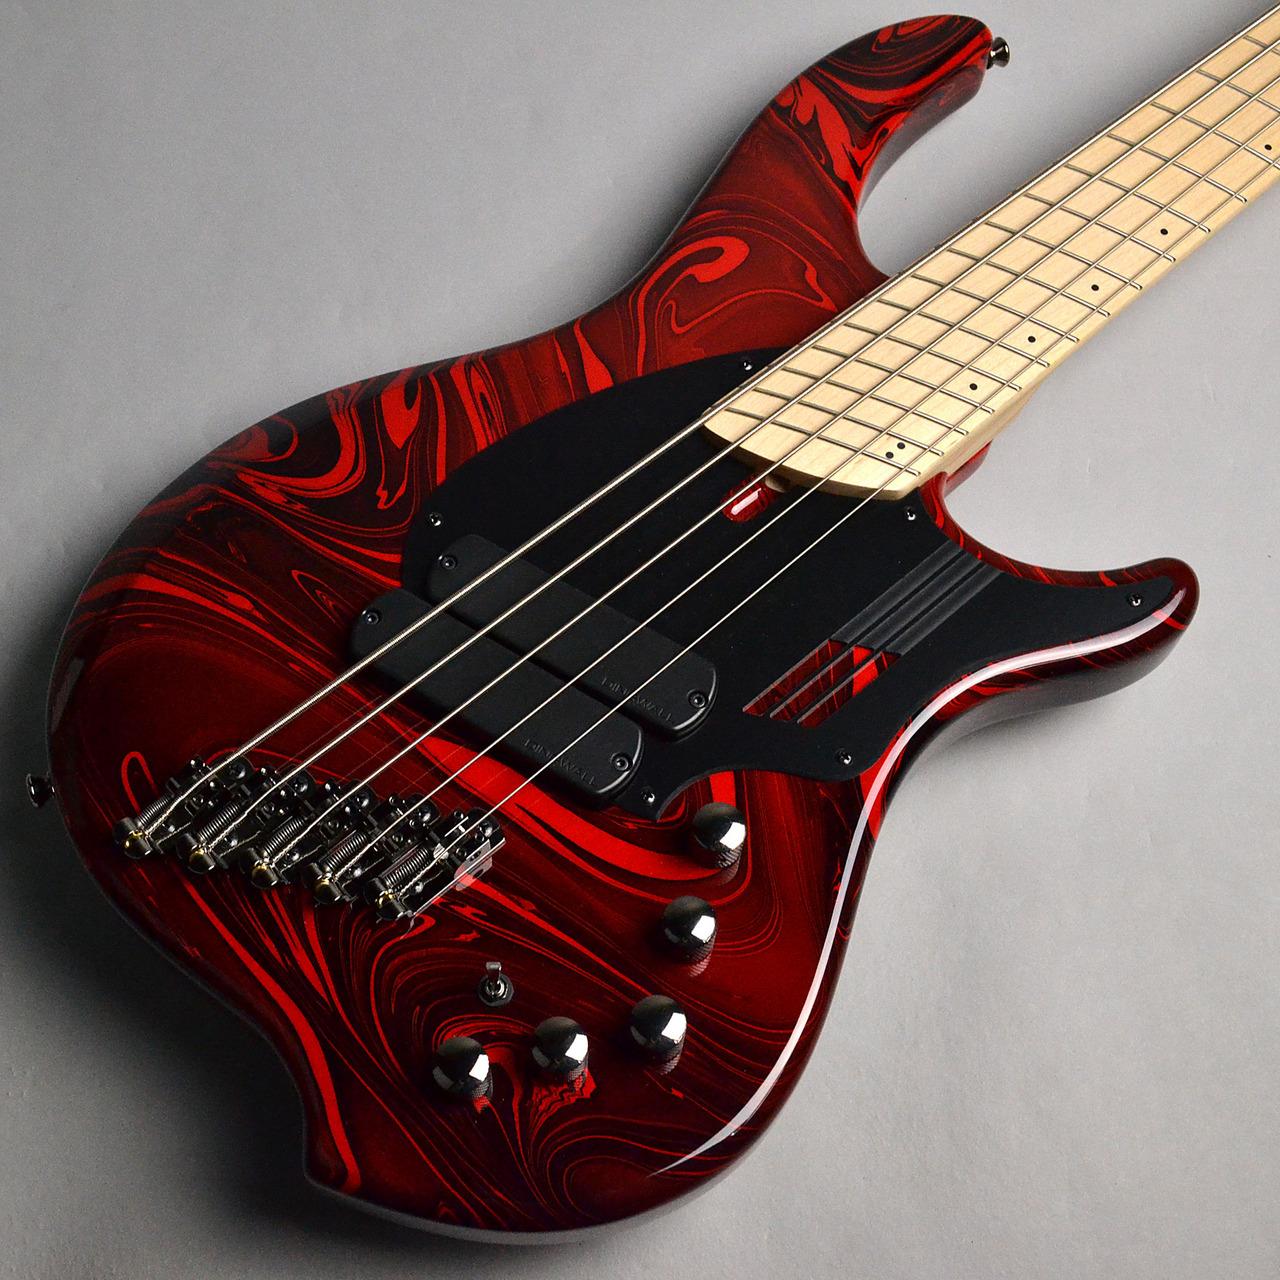 "DINGWALL NG-2 5 String ""Nolly Getgood"" / Ferarri Red Swirl"